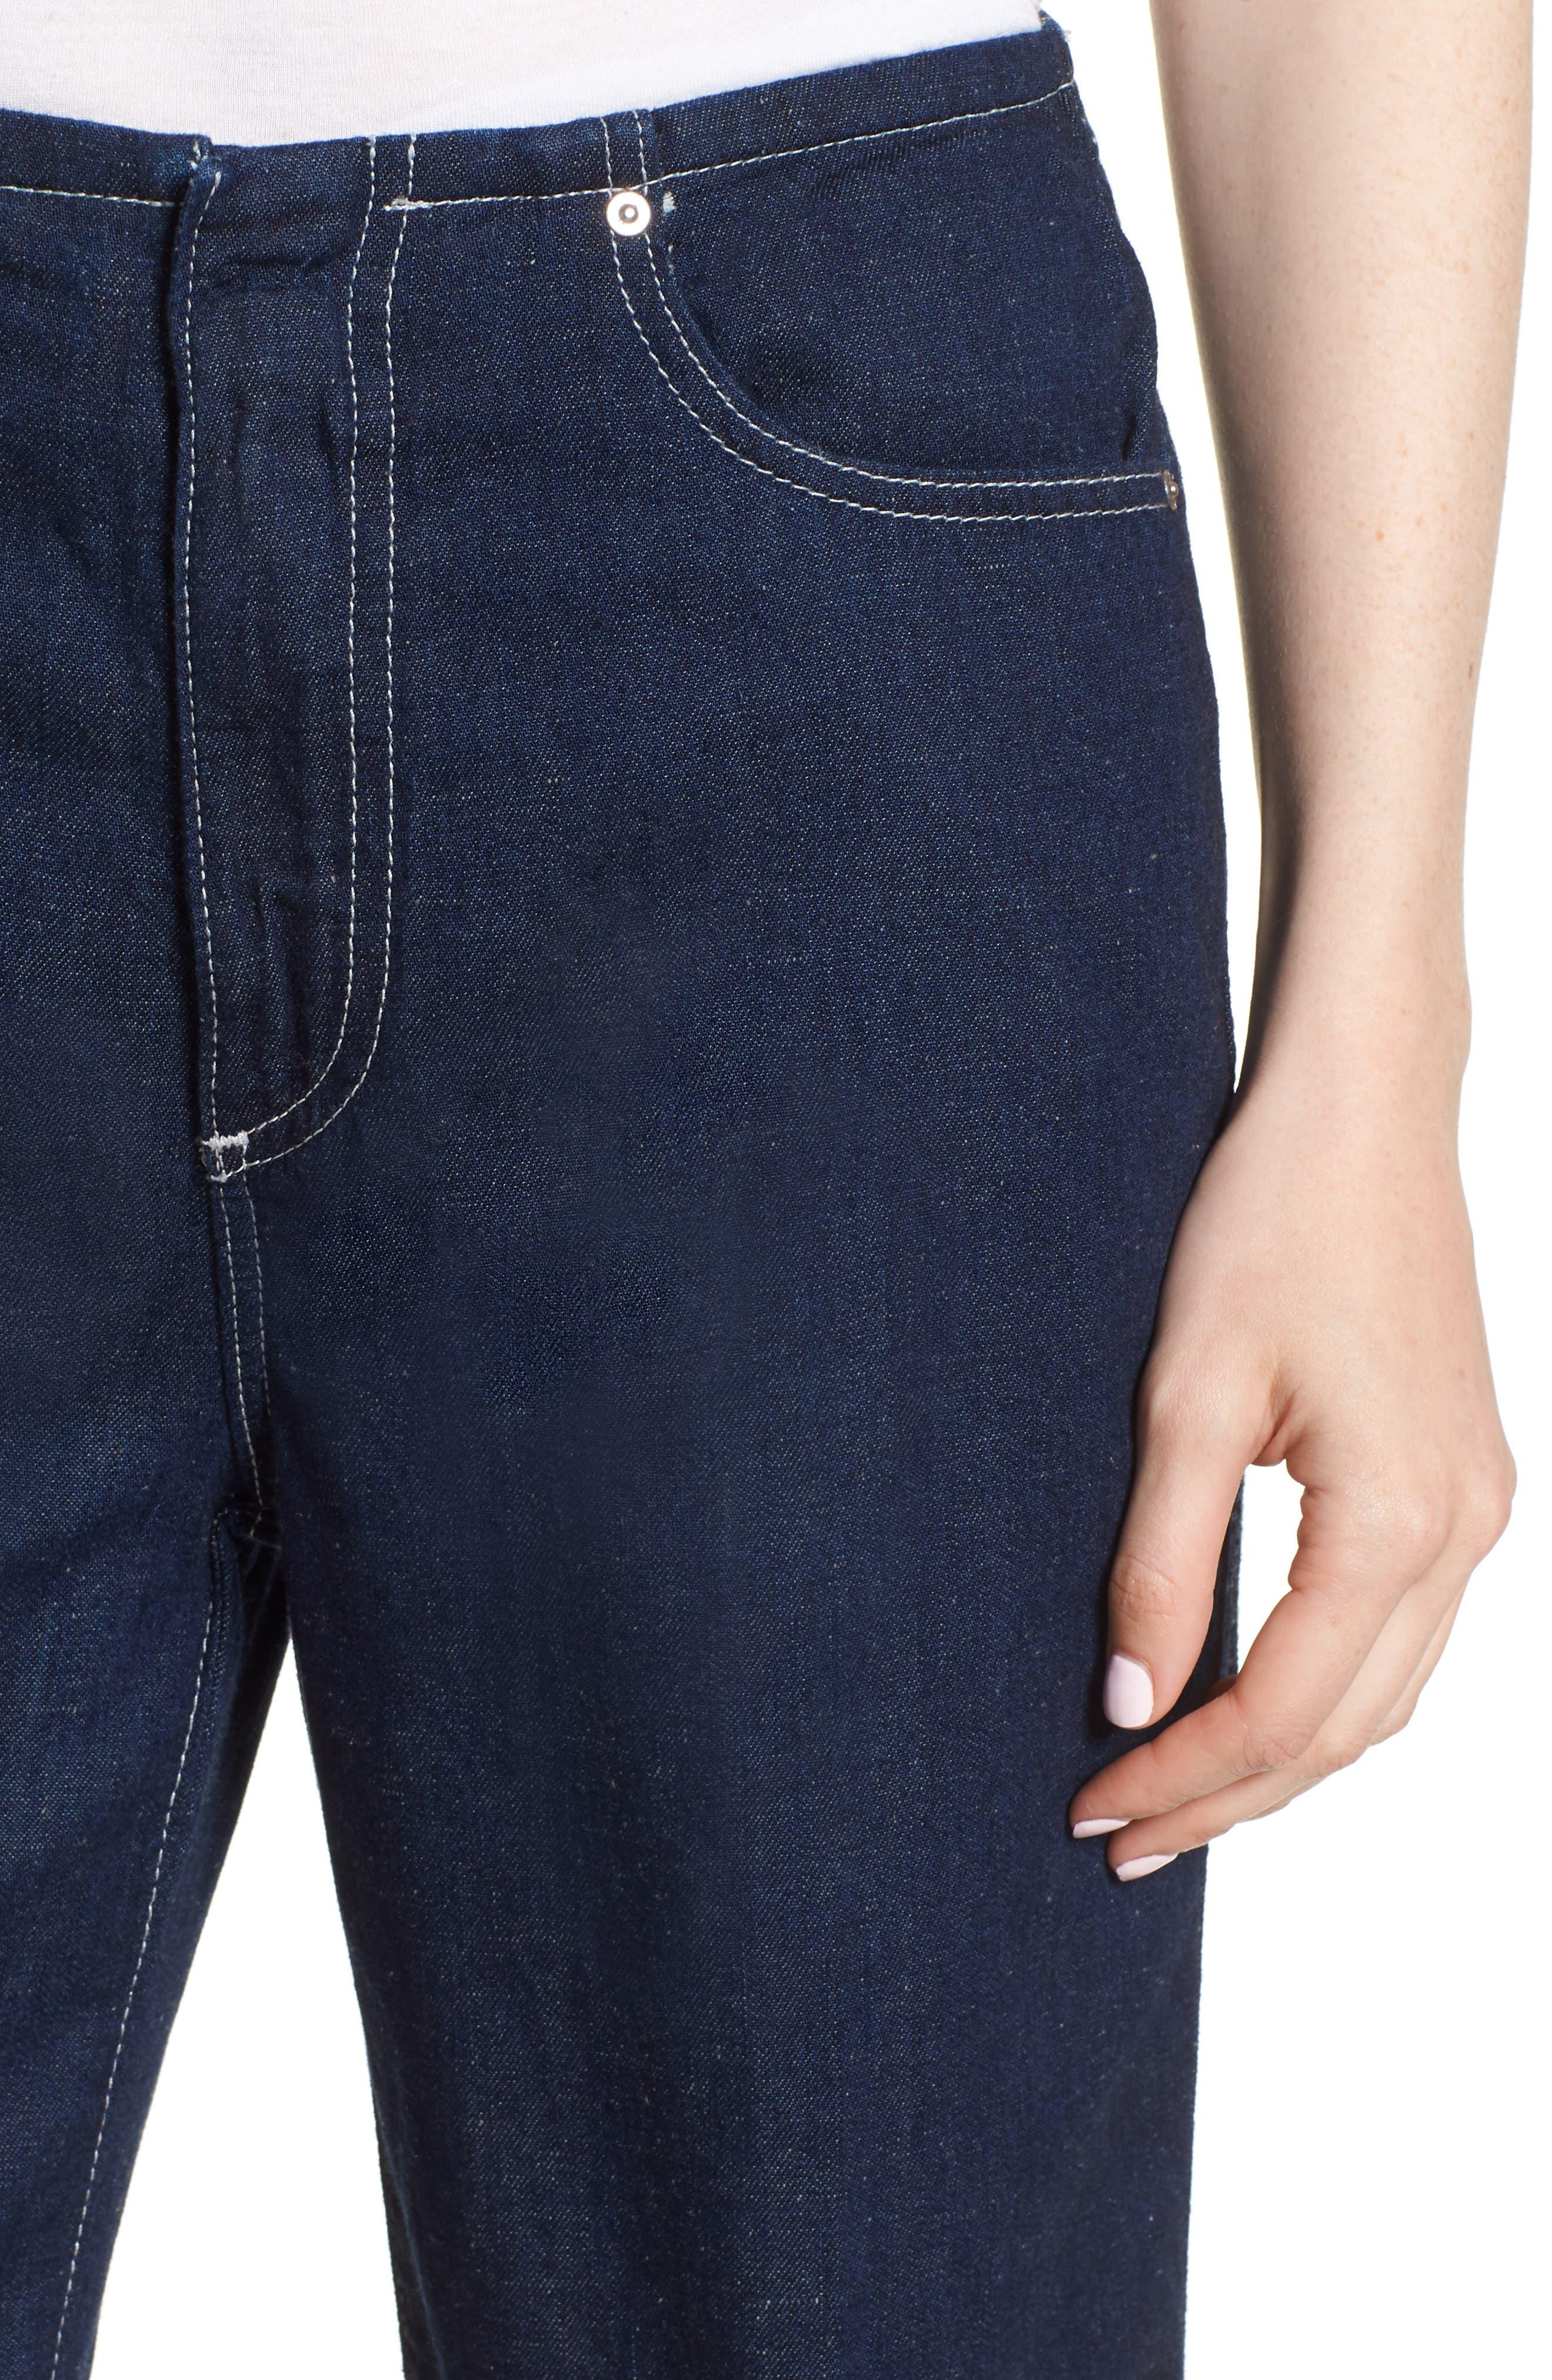 Etta High Waist Crop Wide Leg Jeans,                             Alternate thumbnail 4, color,                             Midnight Surge